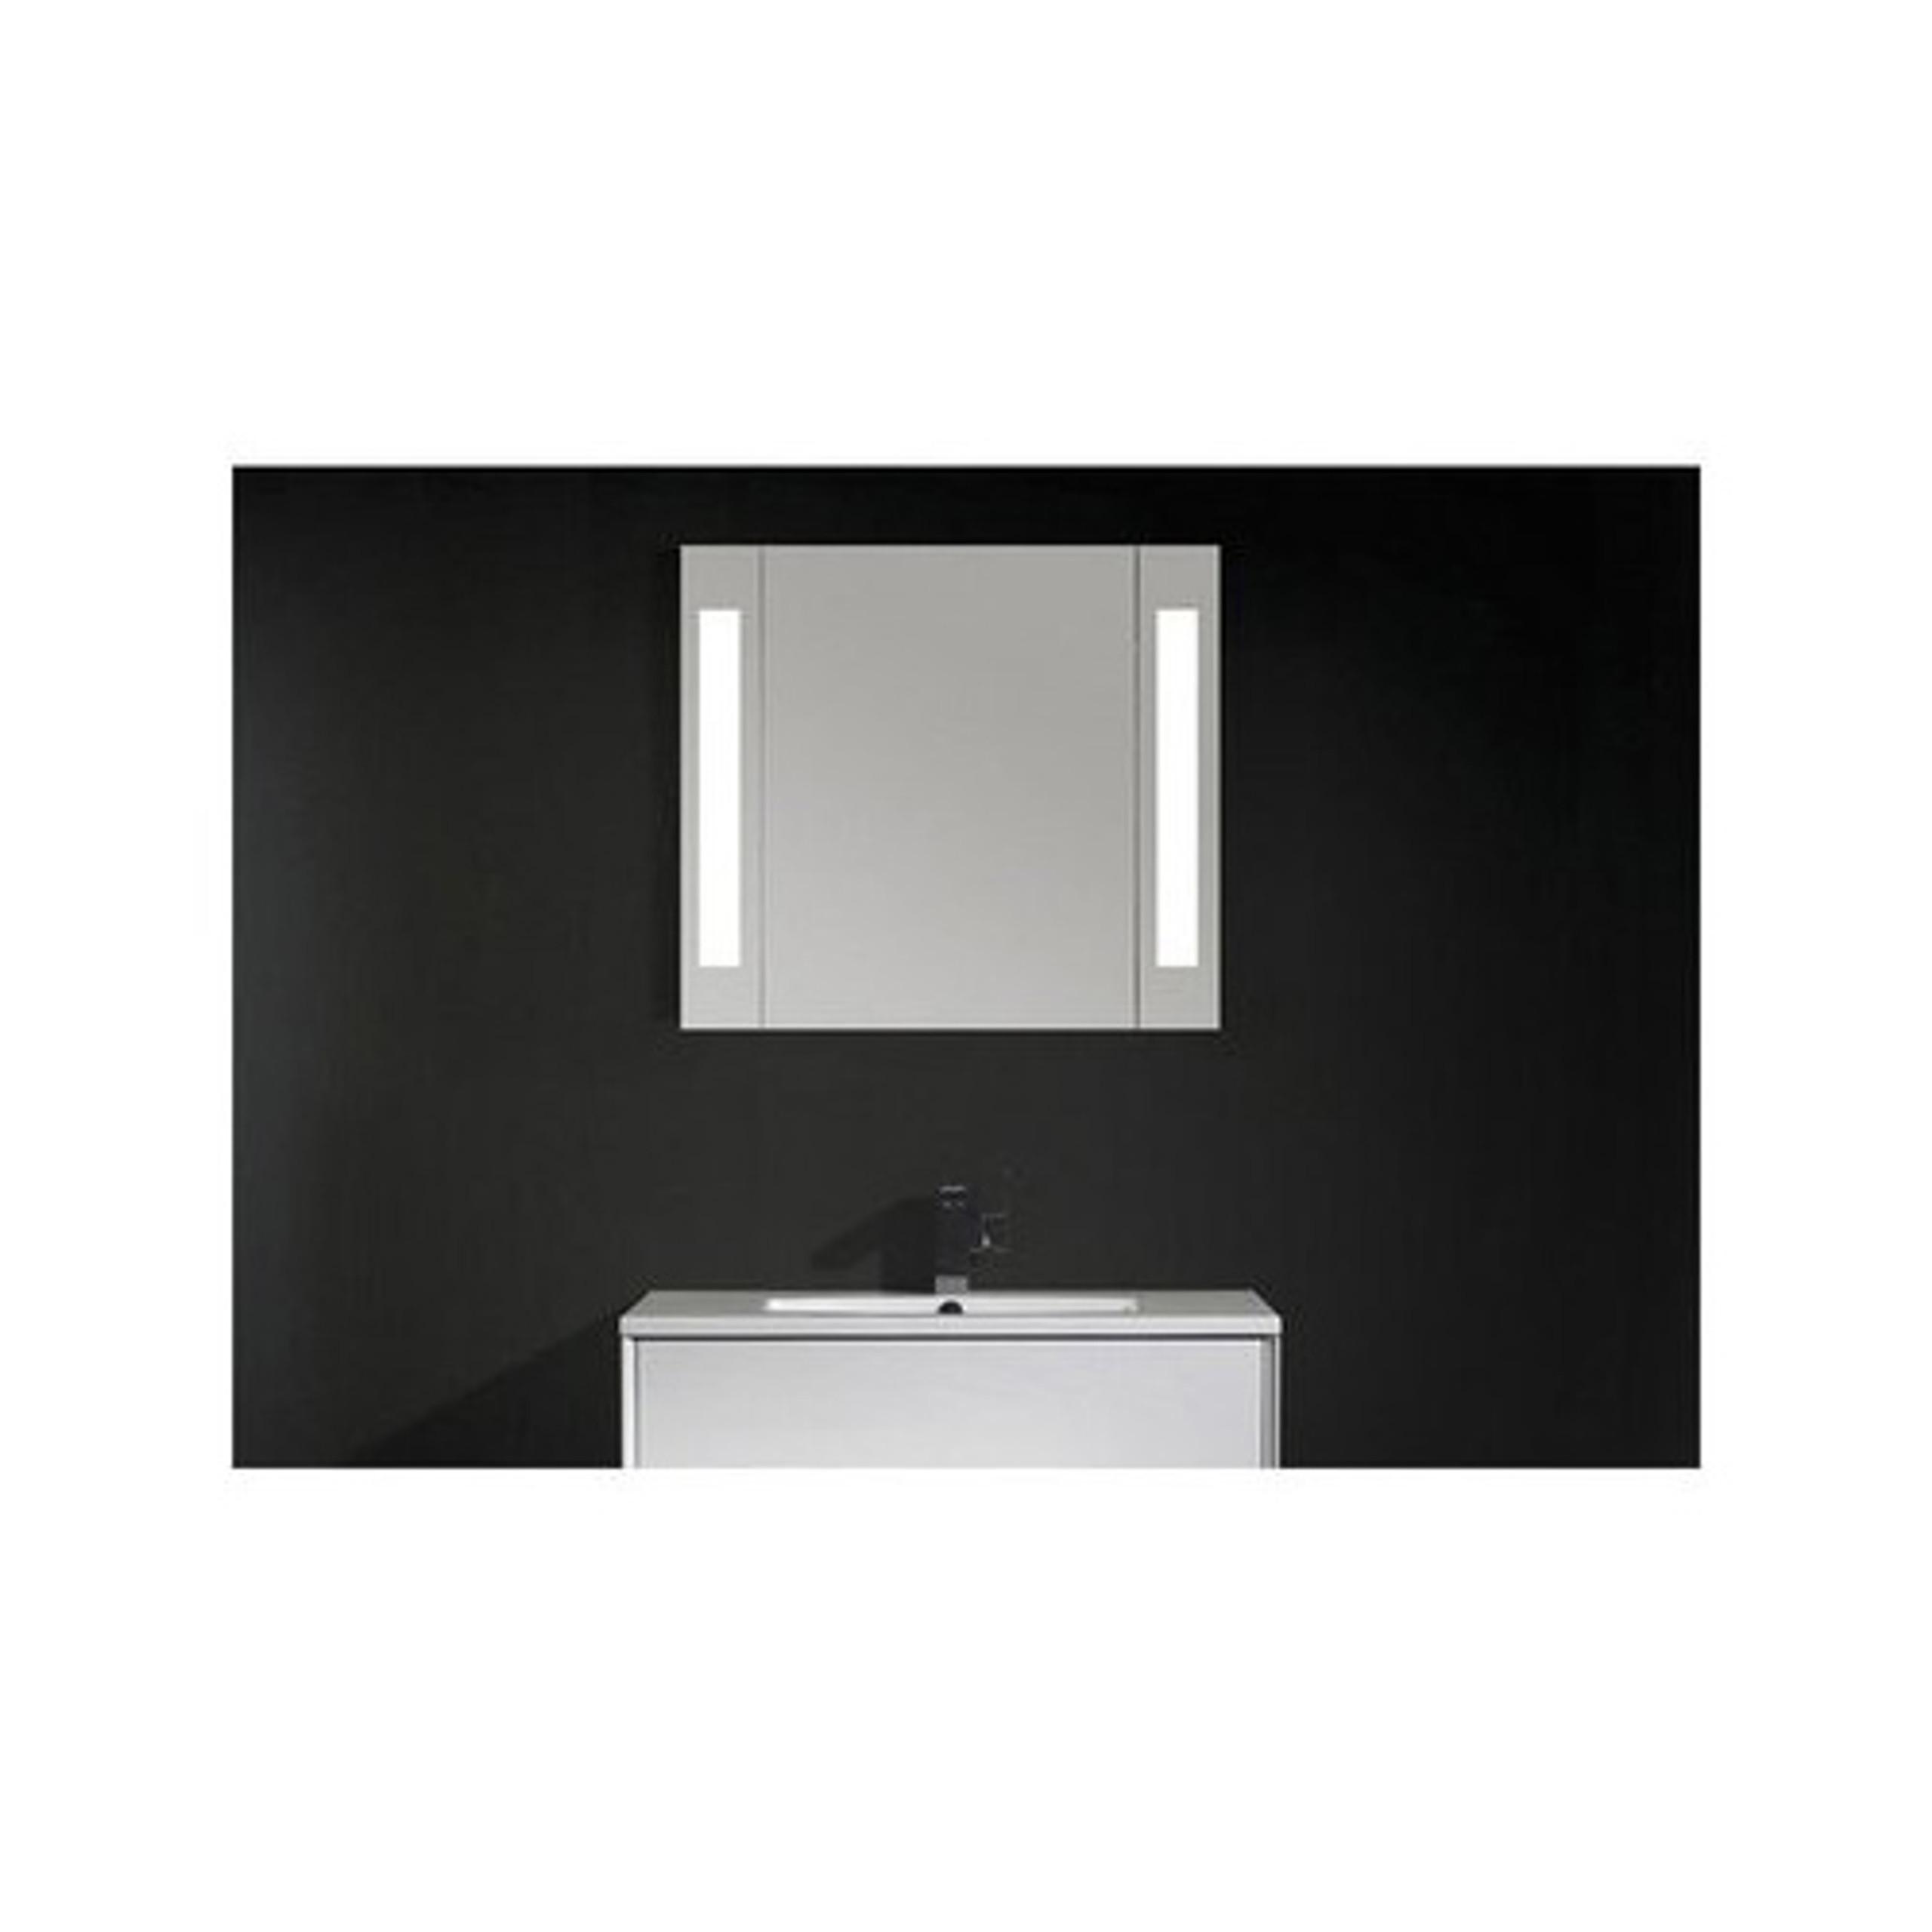 80cm mdf spiegelschrank corner spiegel beleuchtung bad badm bel badschrank spiegelschr nke mdf. Black Bedroom Furniture Sets. Home Design Ideas